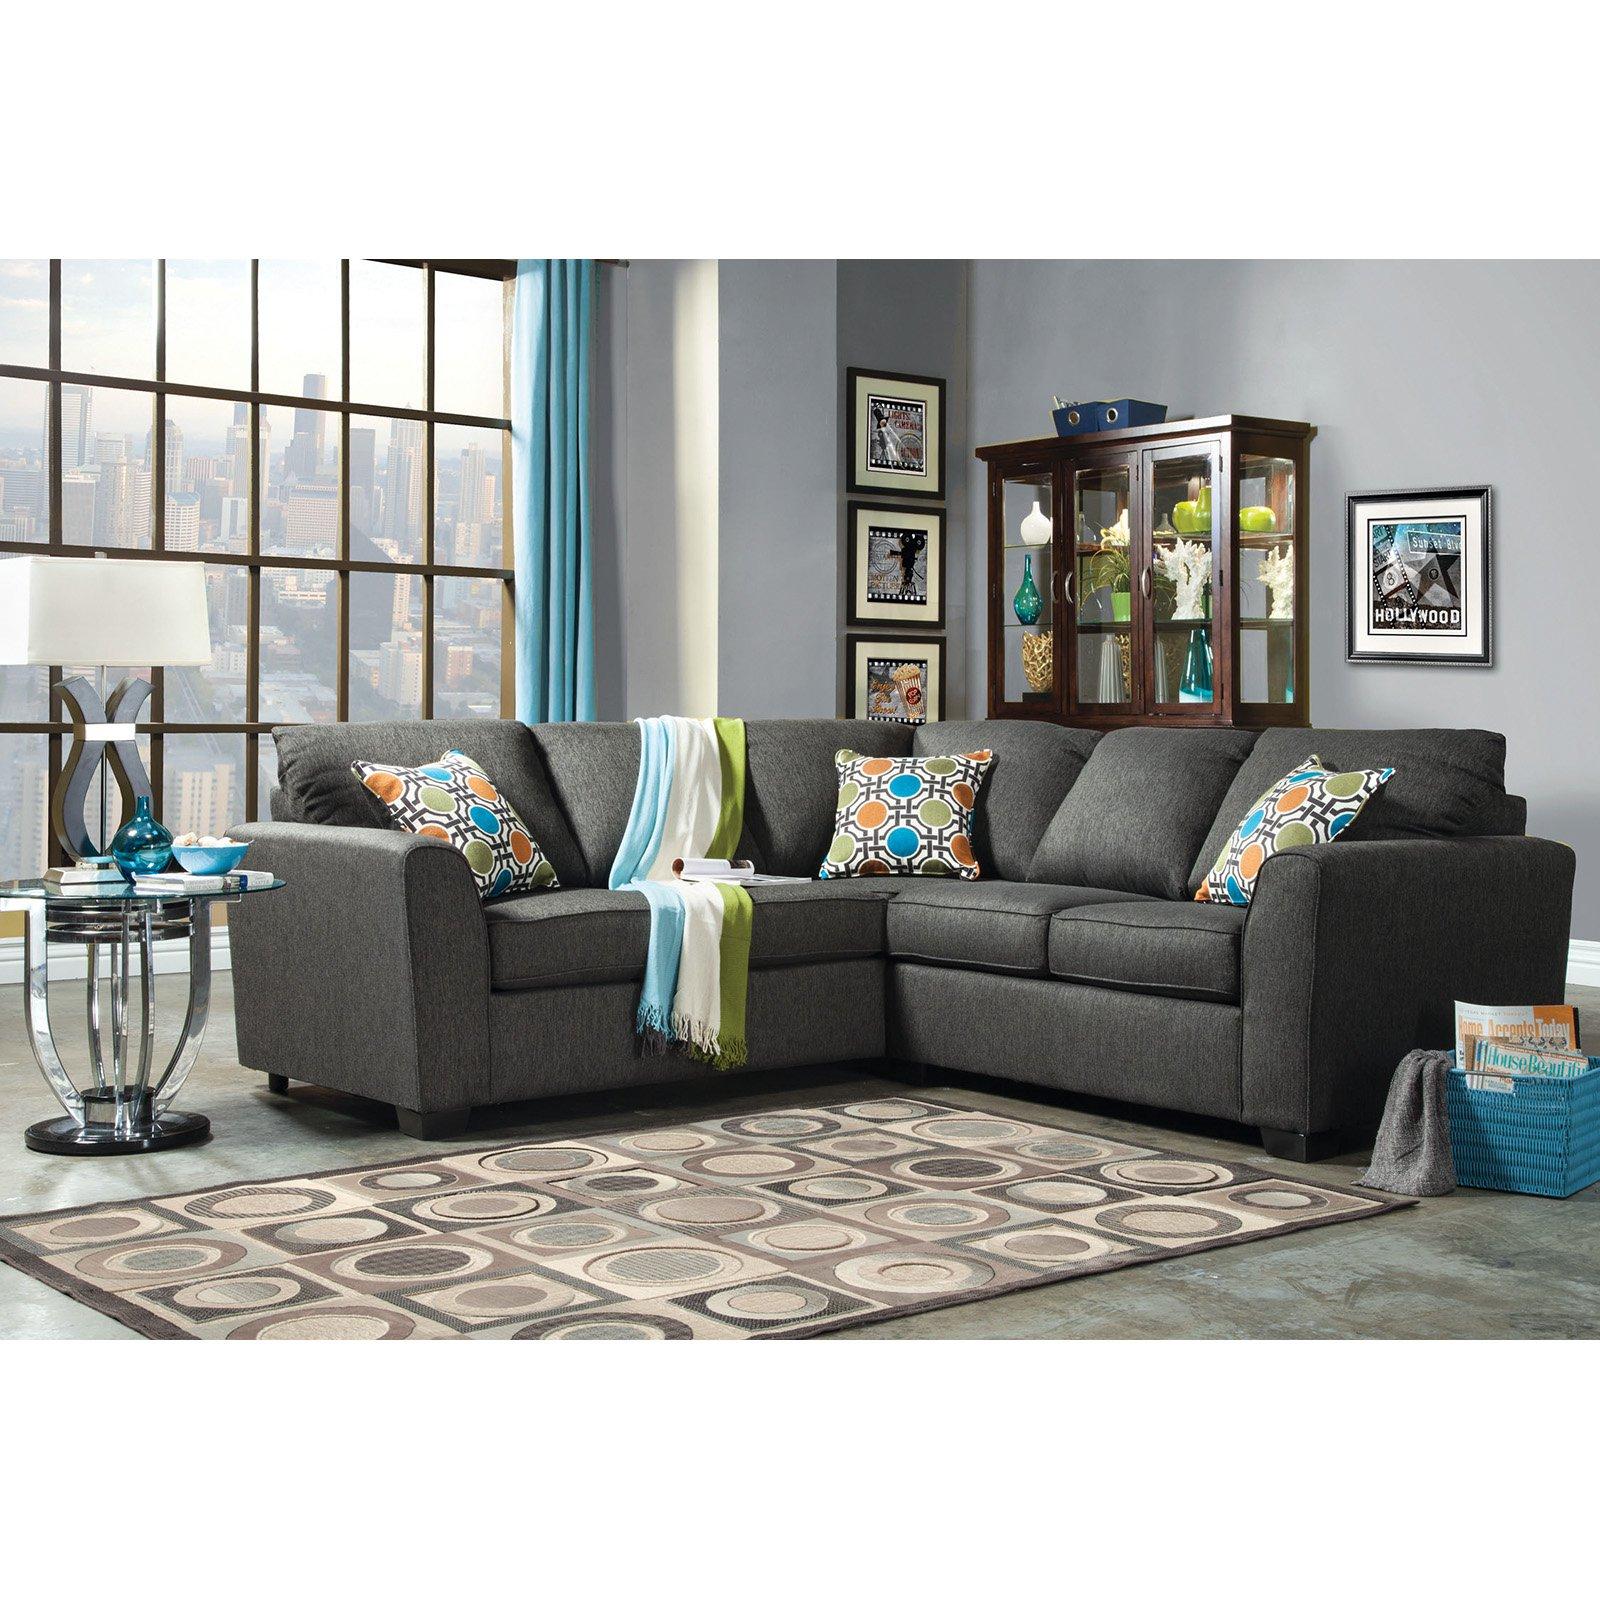 Furniture of america parker 2 piece fabric sectional sofa gray walmart com